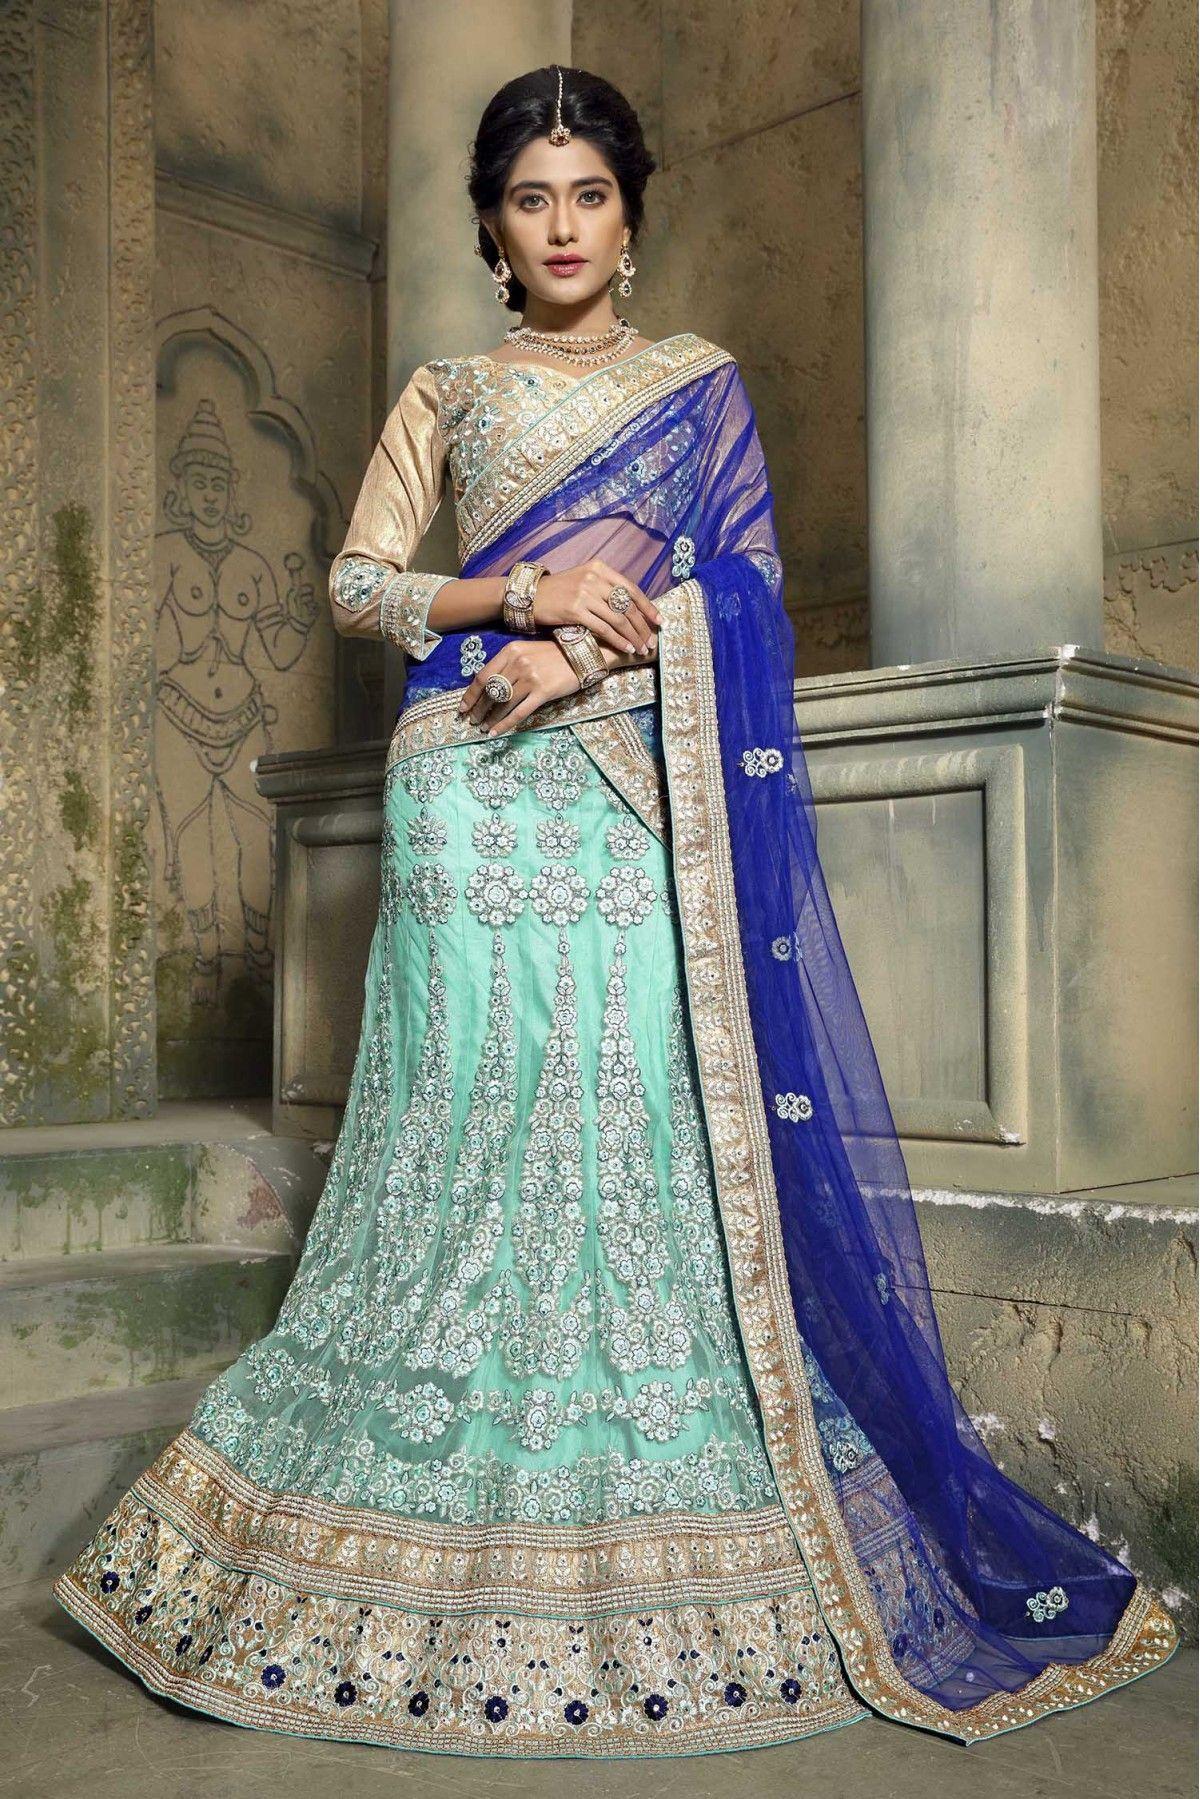 Net Wedding Wear Lehenga Choli In Turquoise Colour   Wedding wear ...